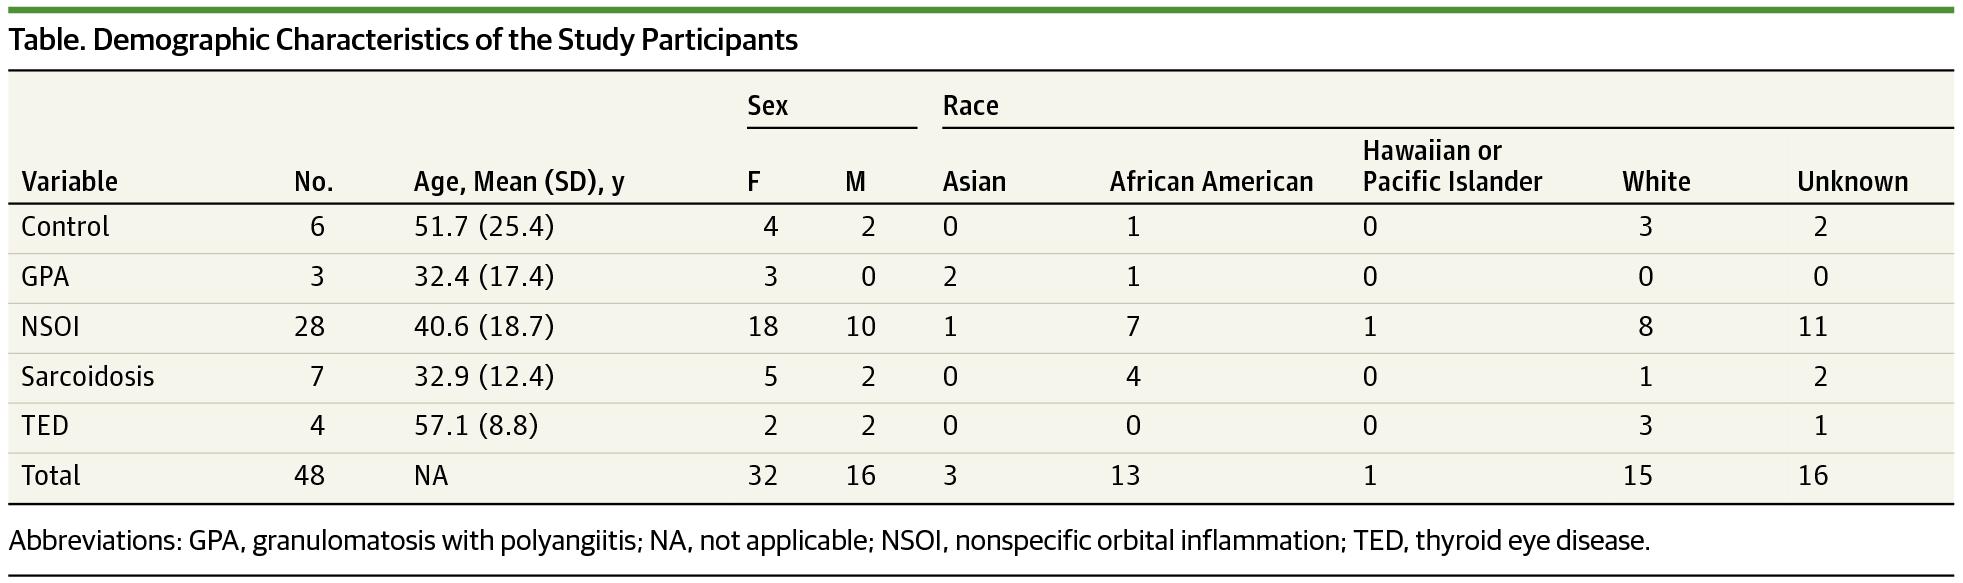 Demographic Characteristics Of The Study Participants